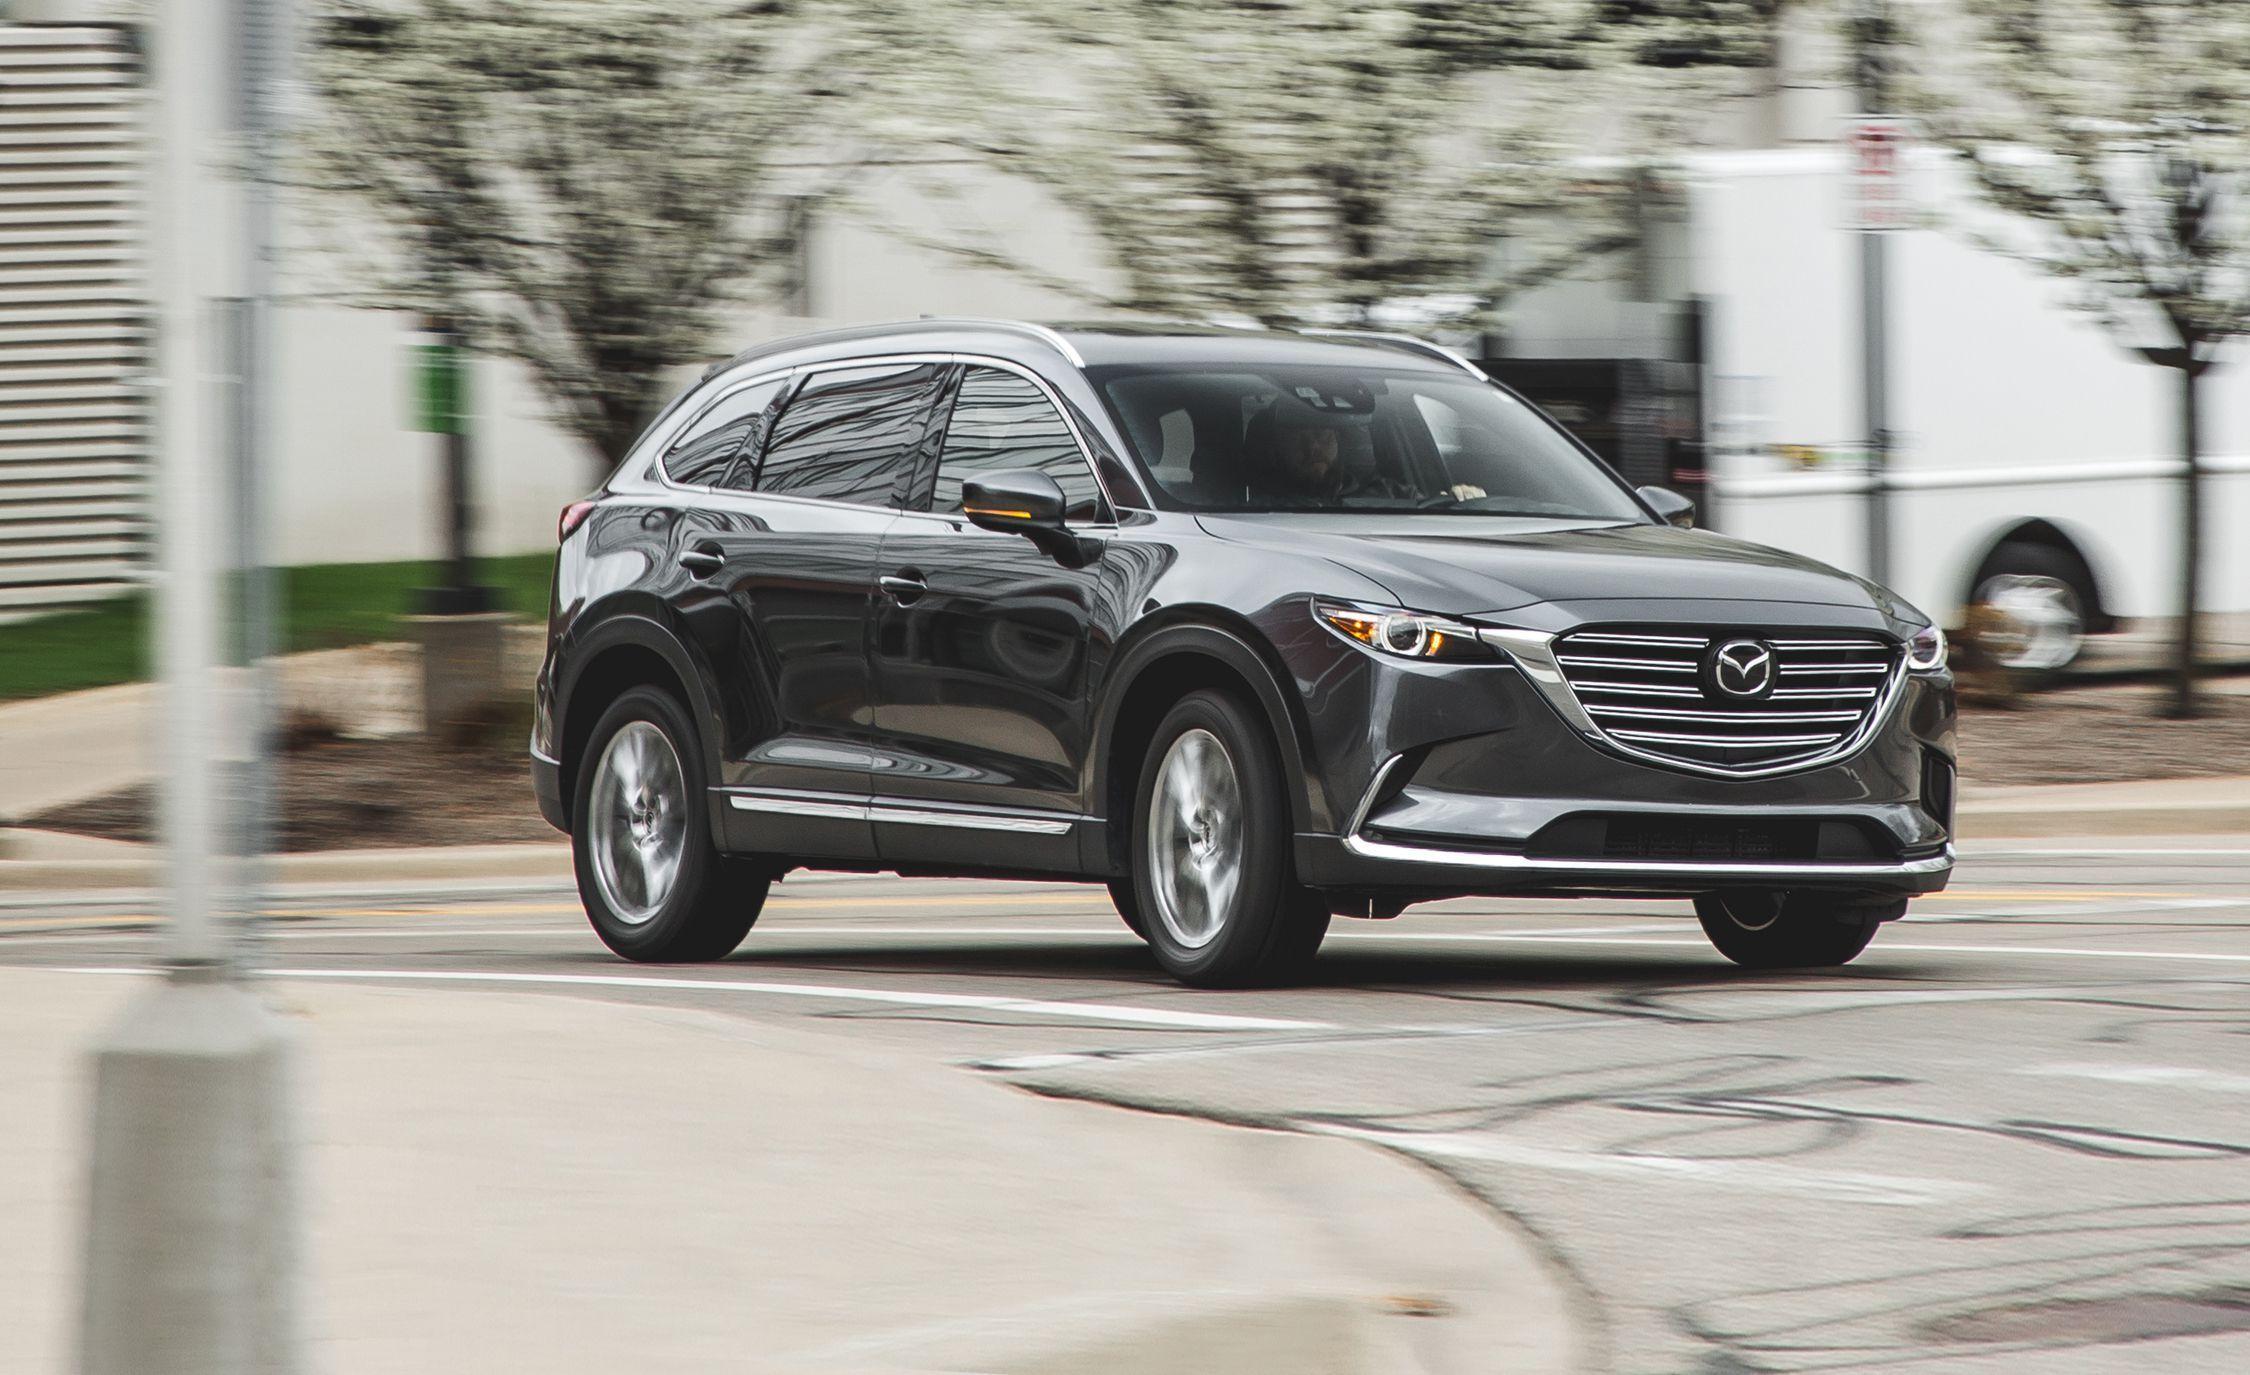 Top 2018 Mazda Cx 9 Reviews